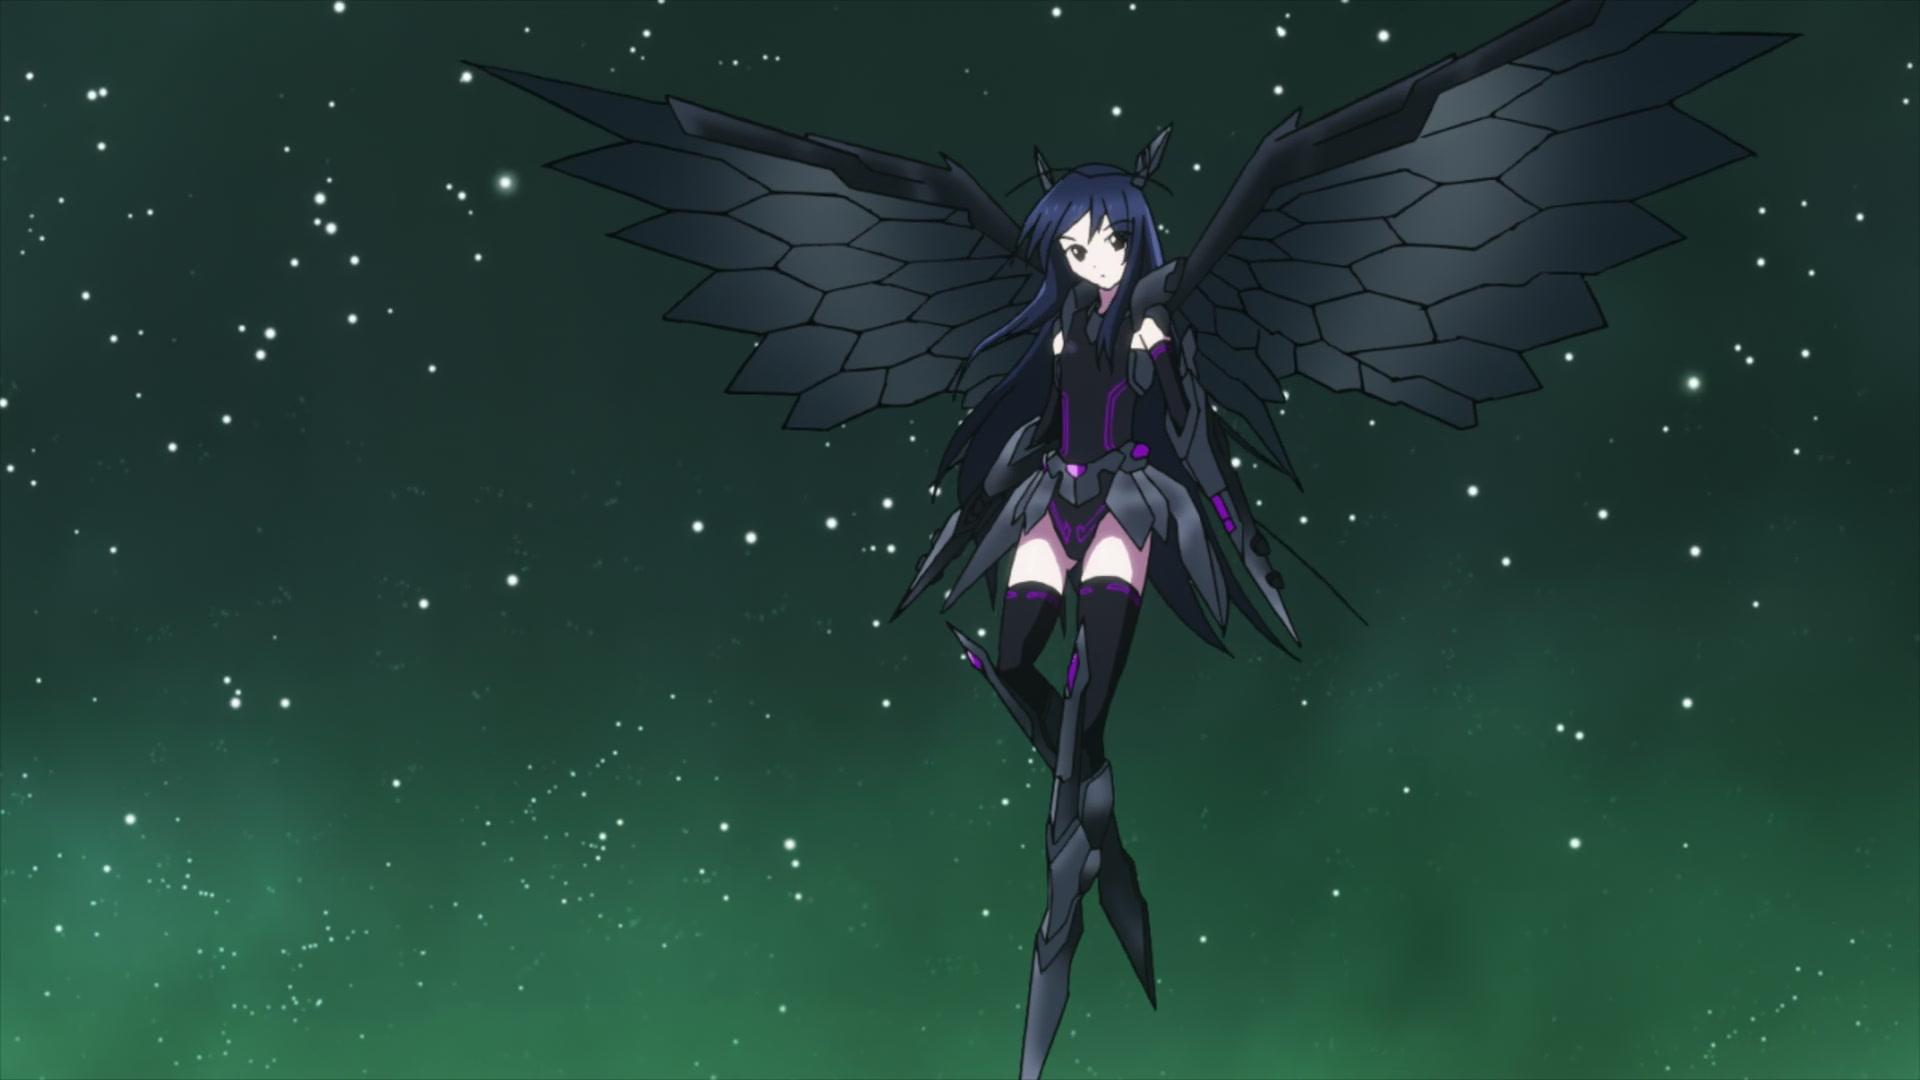 Black Lotus Kuroyukihime Wallpaper 1417361 Zerochan Anime Image Board